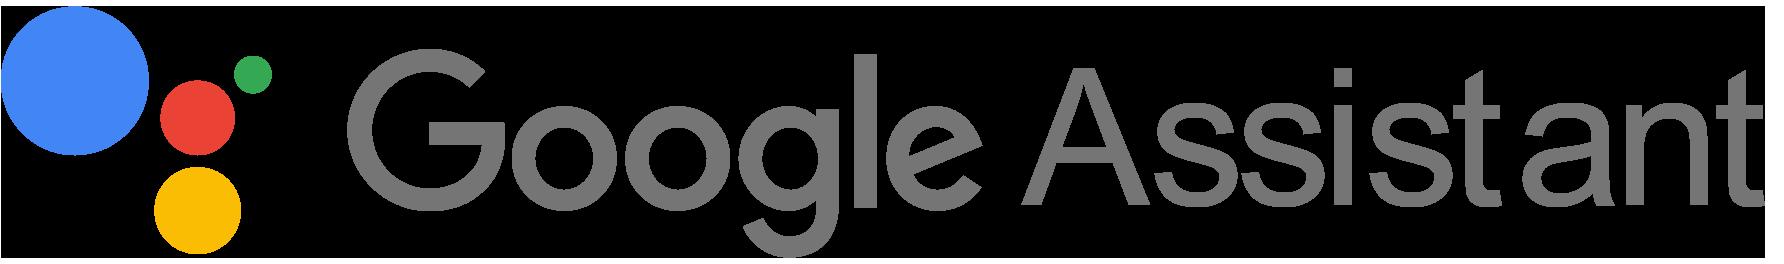 Google Assistant Logo Actions Builder